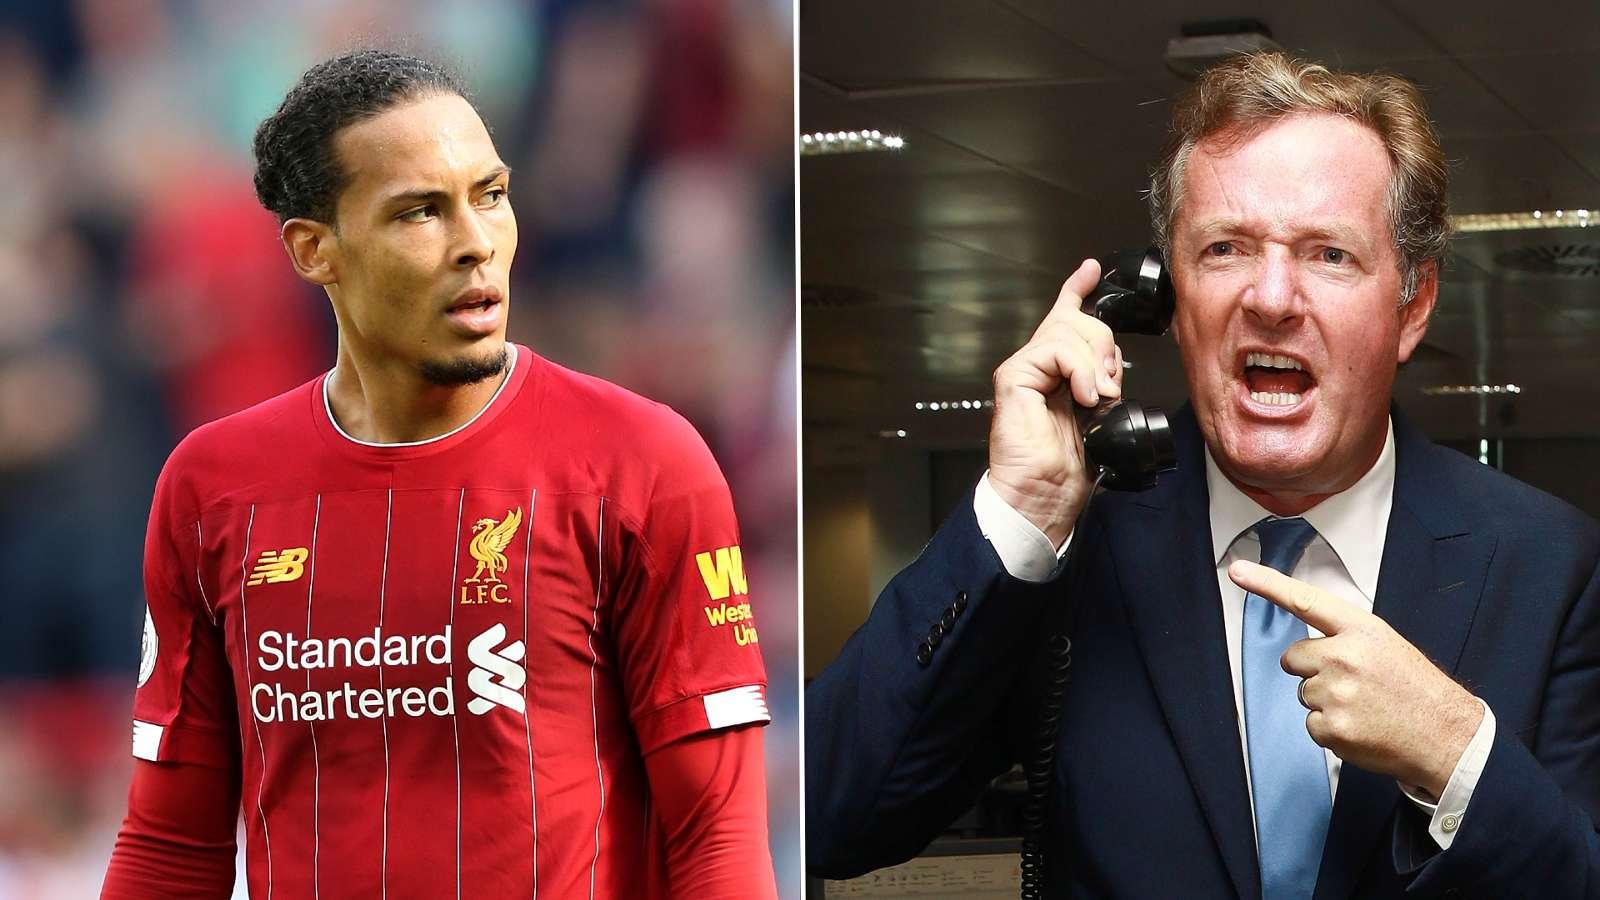 Piers Morgan shut down by Van Dijk after celebrity's knee-jerk reaction to Ronaldo's Ballon d'Or no-show joke - Bóng Đá